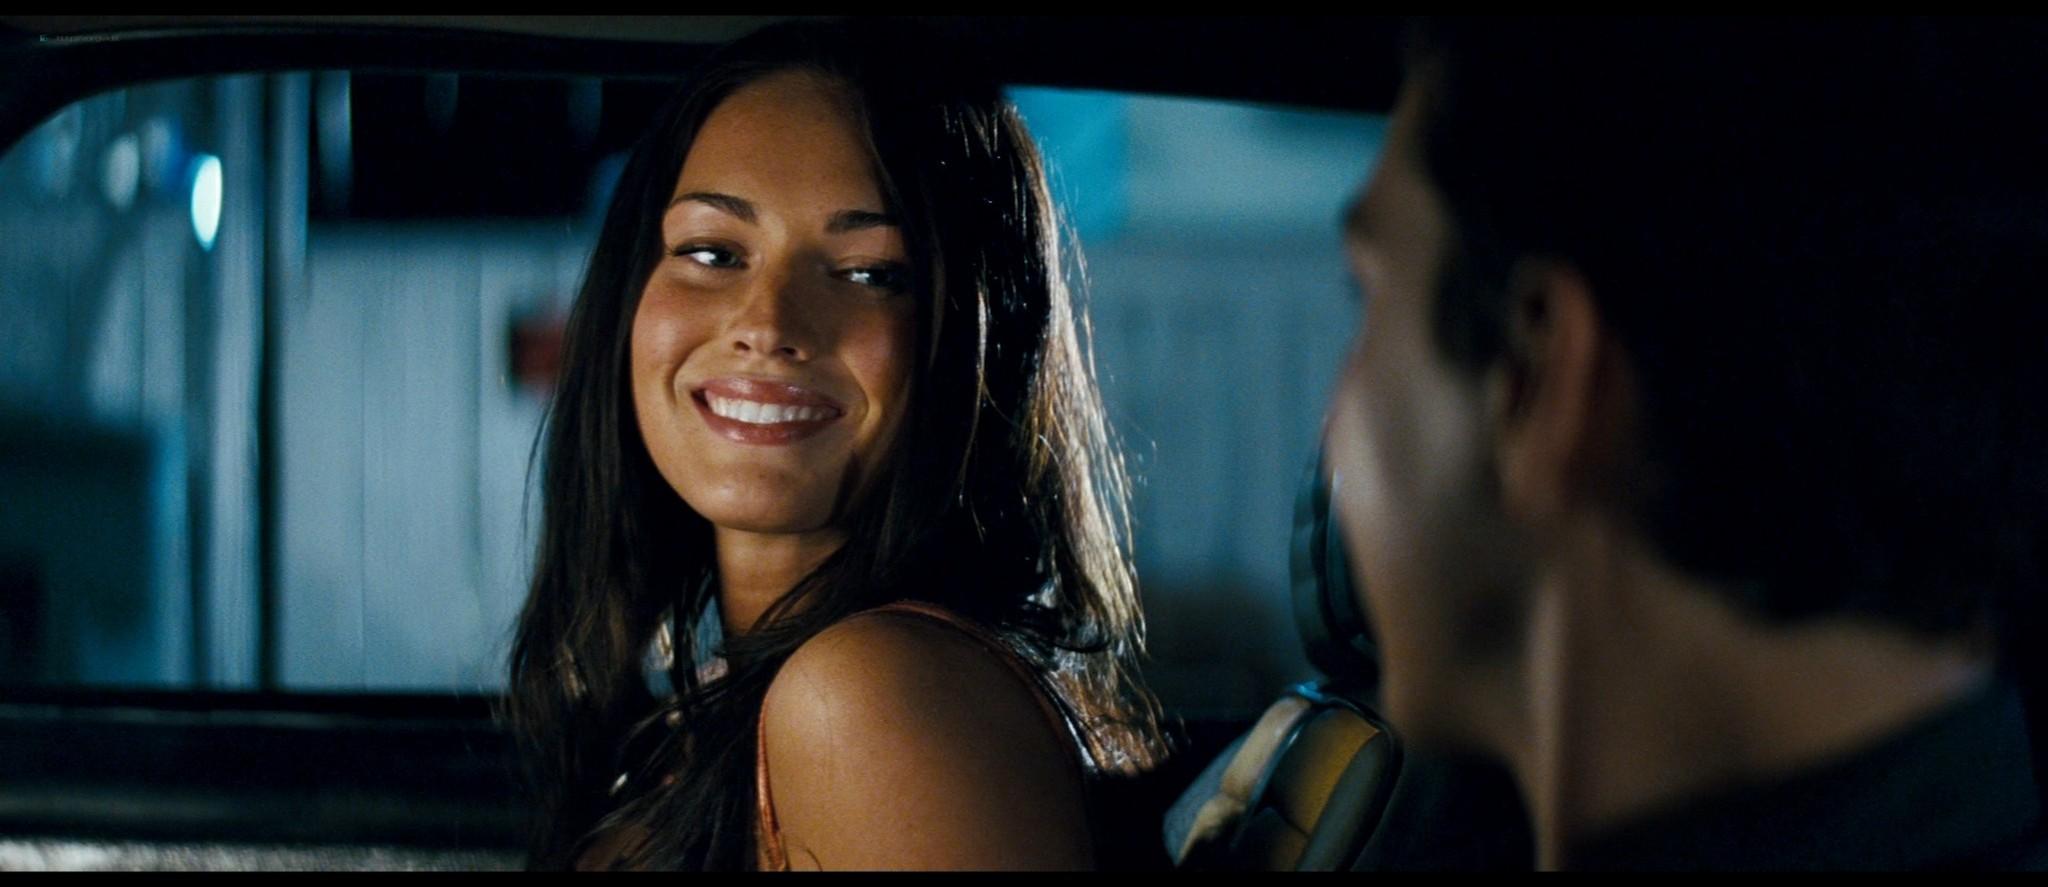 Megan Fox hot and sexy - Transformers (2007) HD 1080p BluRay Remux (10)